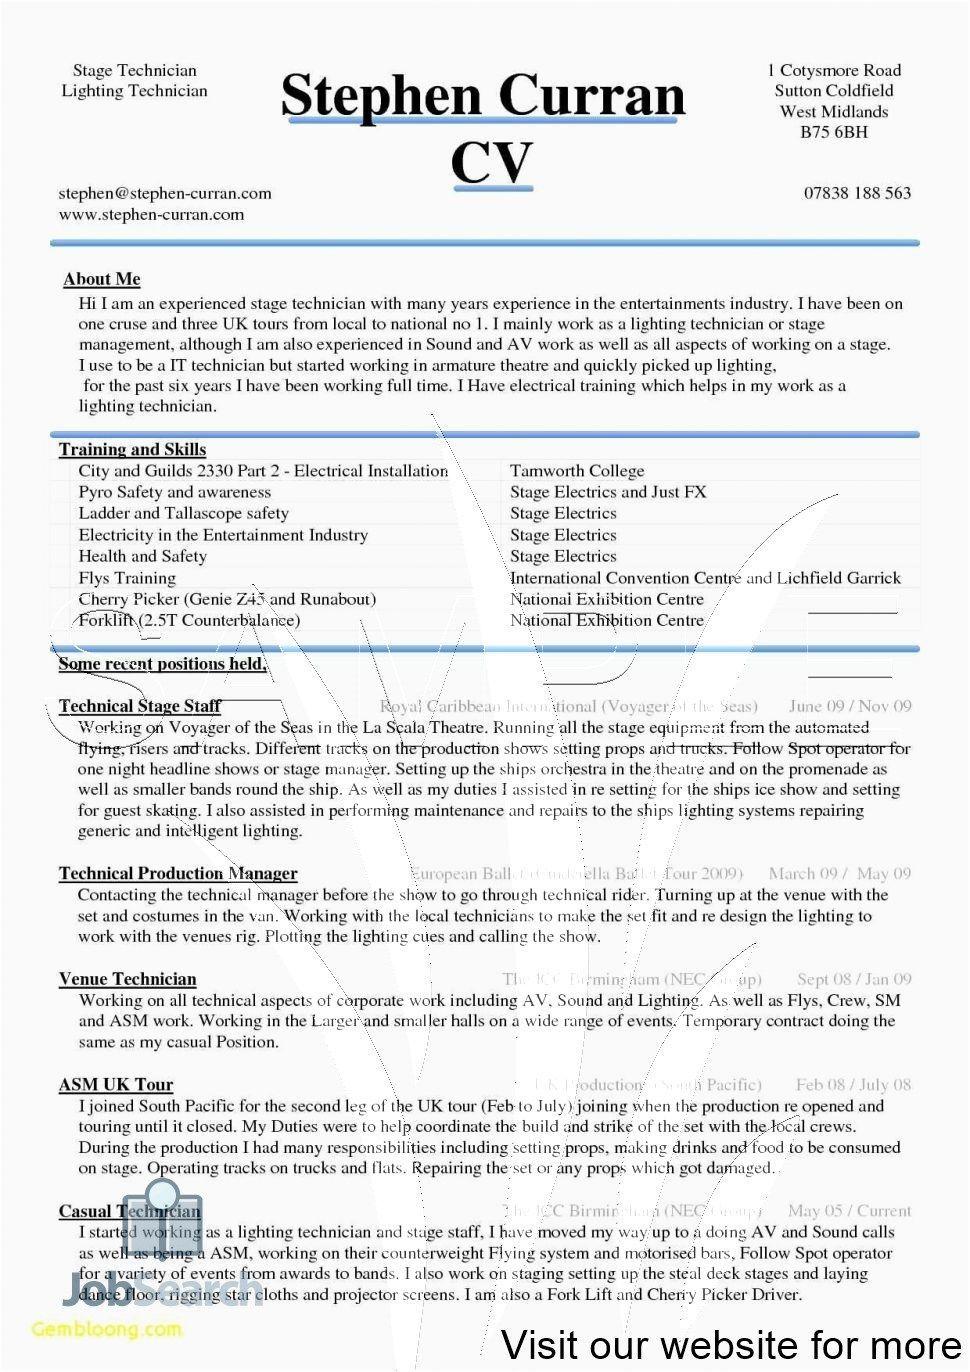 002 Wondrou Professional Cv Template Free Word Example  Uk Best Resume DownloadFull